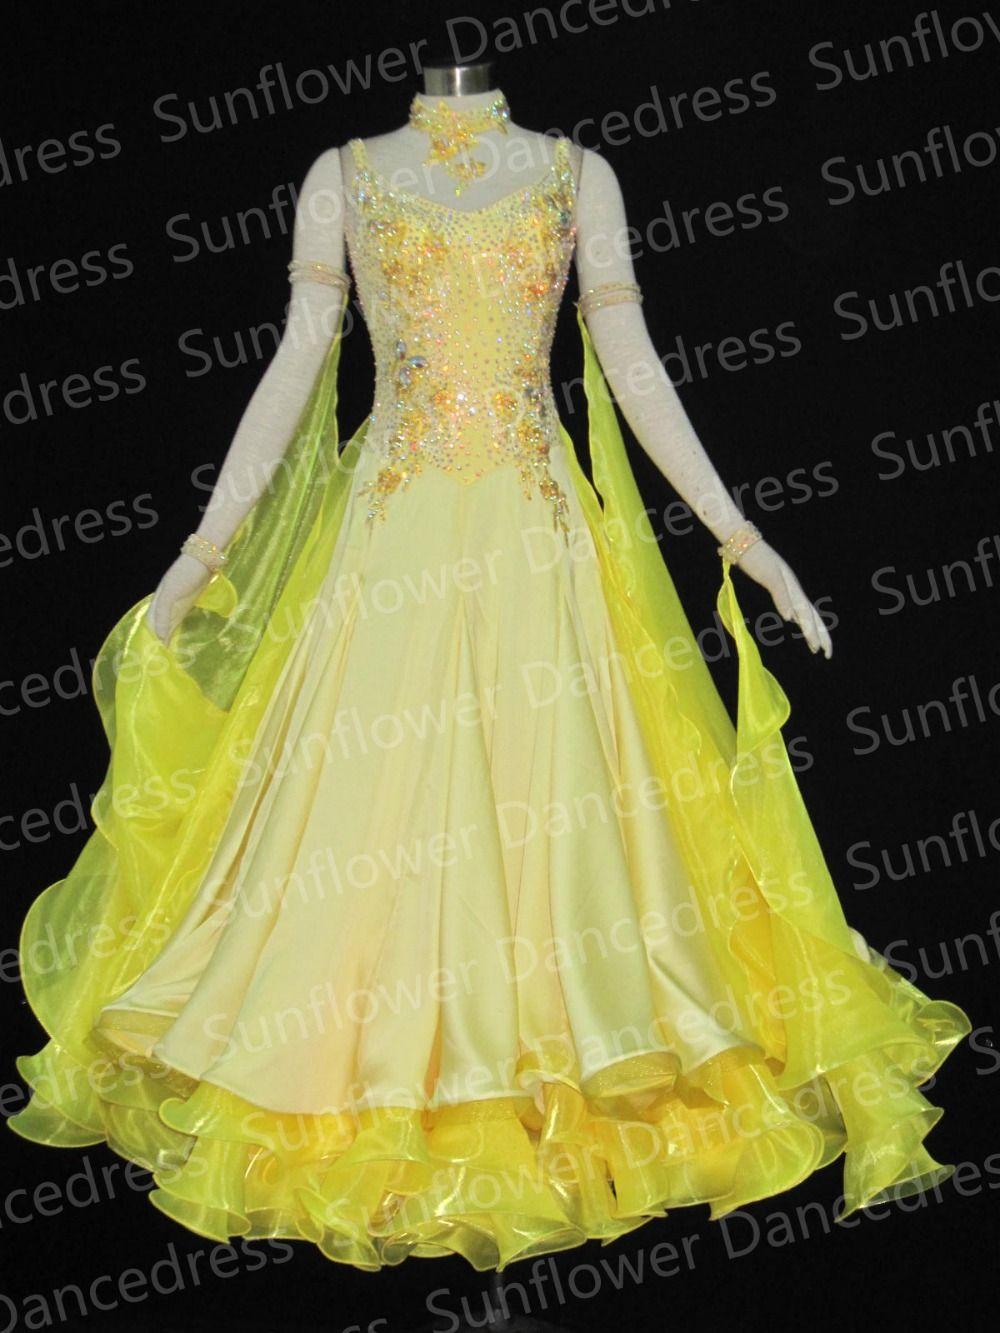 Moderne Walzer Tango Ballroom Dance Kleid, Glatte Ballsaal Kleid, Standard Ballsaal Kleid, ballsaal tanzen kleid